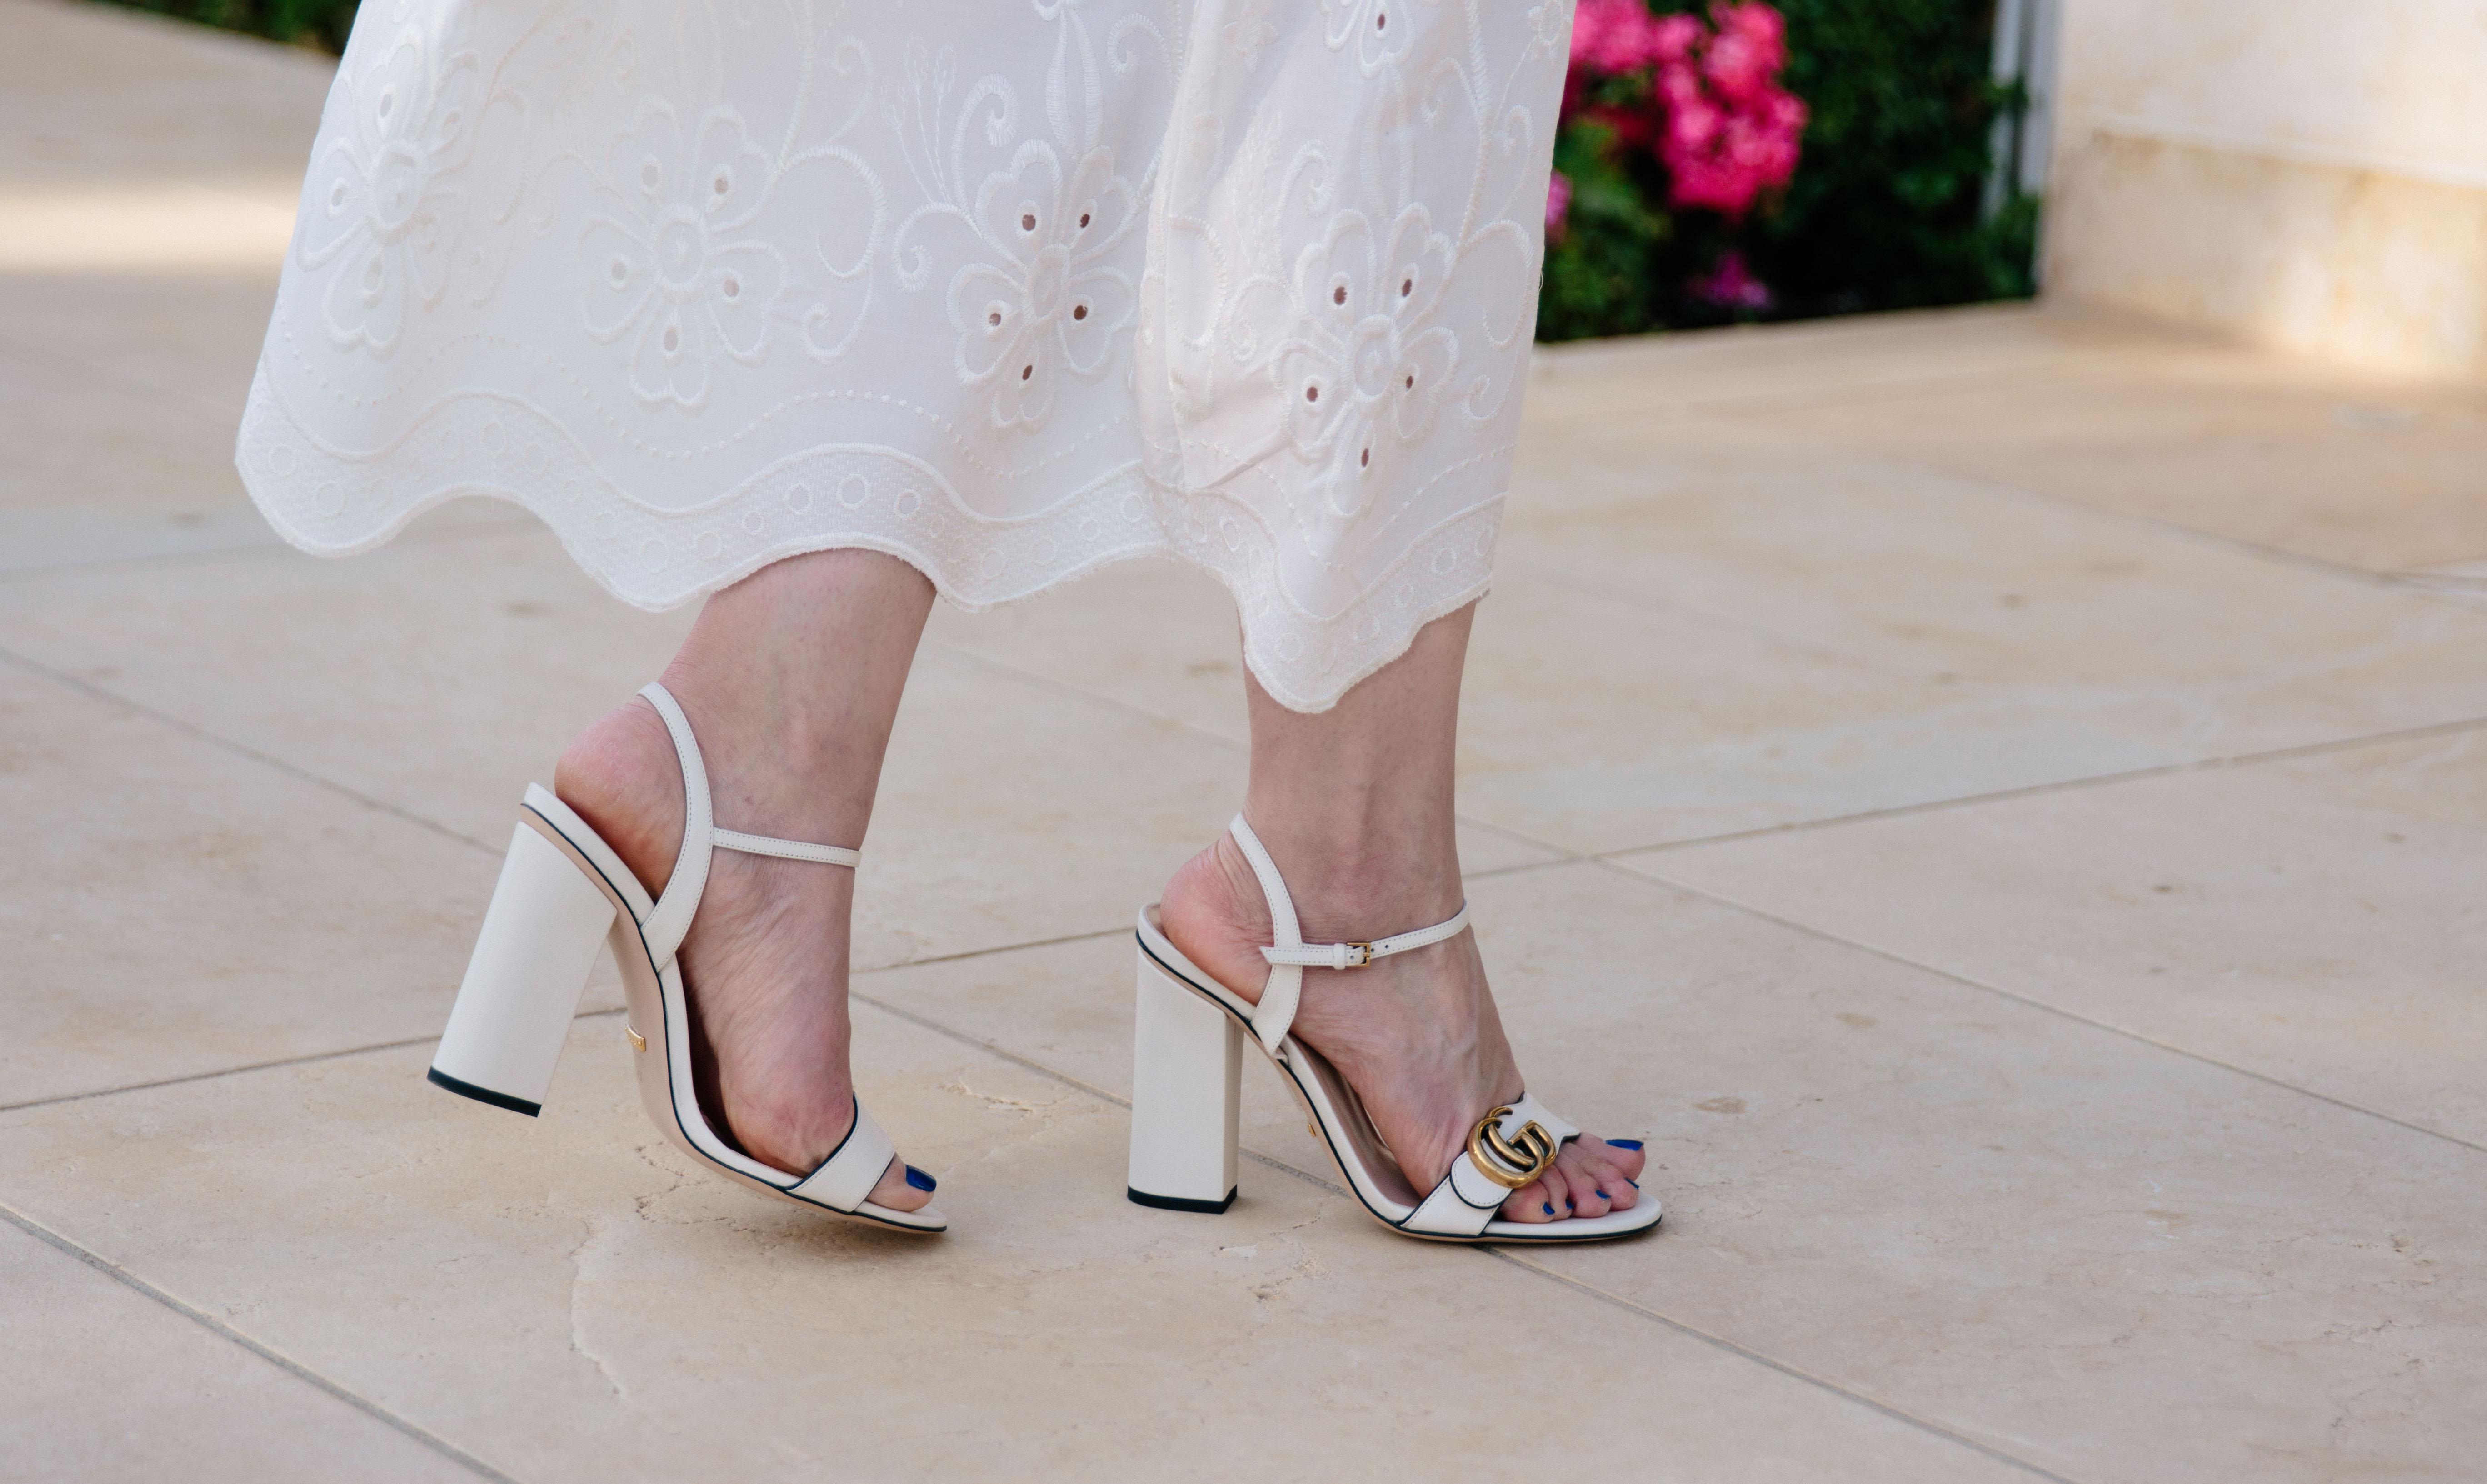 6d9645989f1c Gucci white Marmont block heel sandals white white lace dress ...